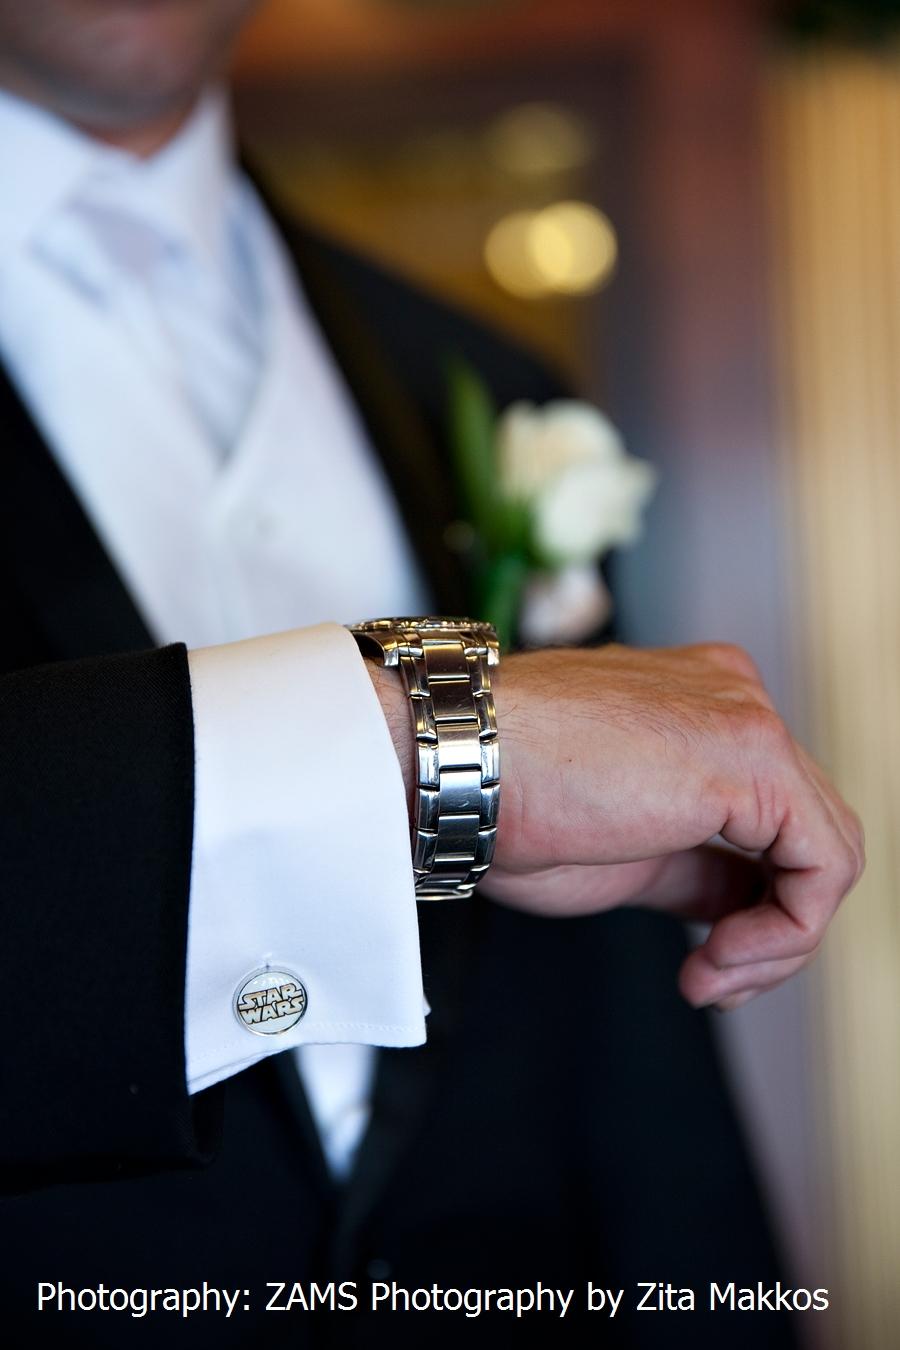 slipknot_craig_133_cuff_links_men_wedding_groomsmen_cufflinks_2.jpg